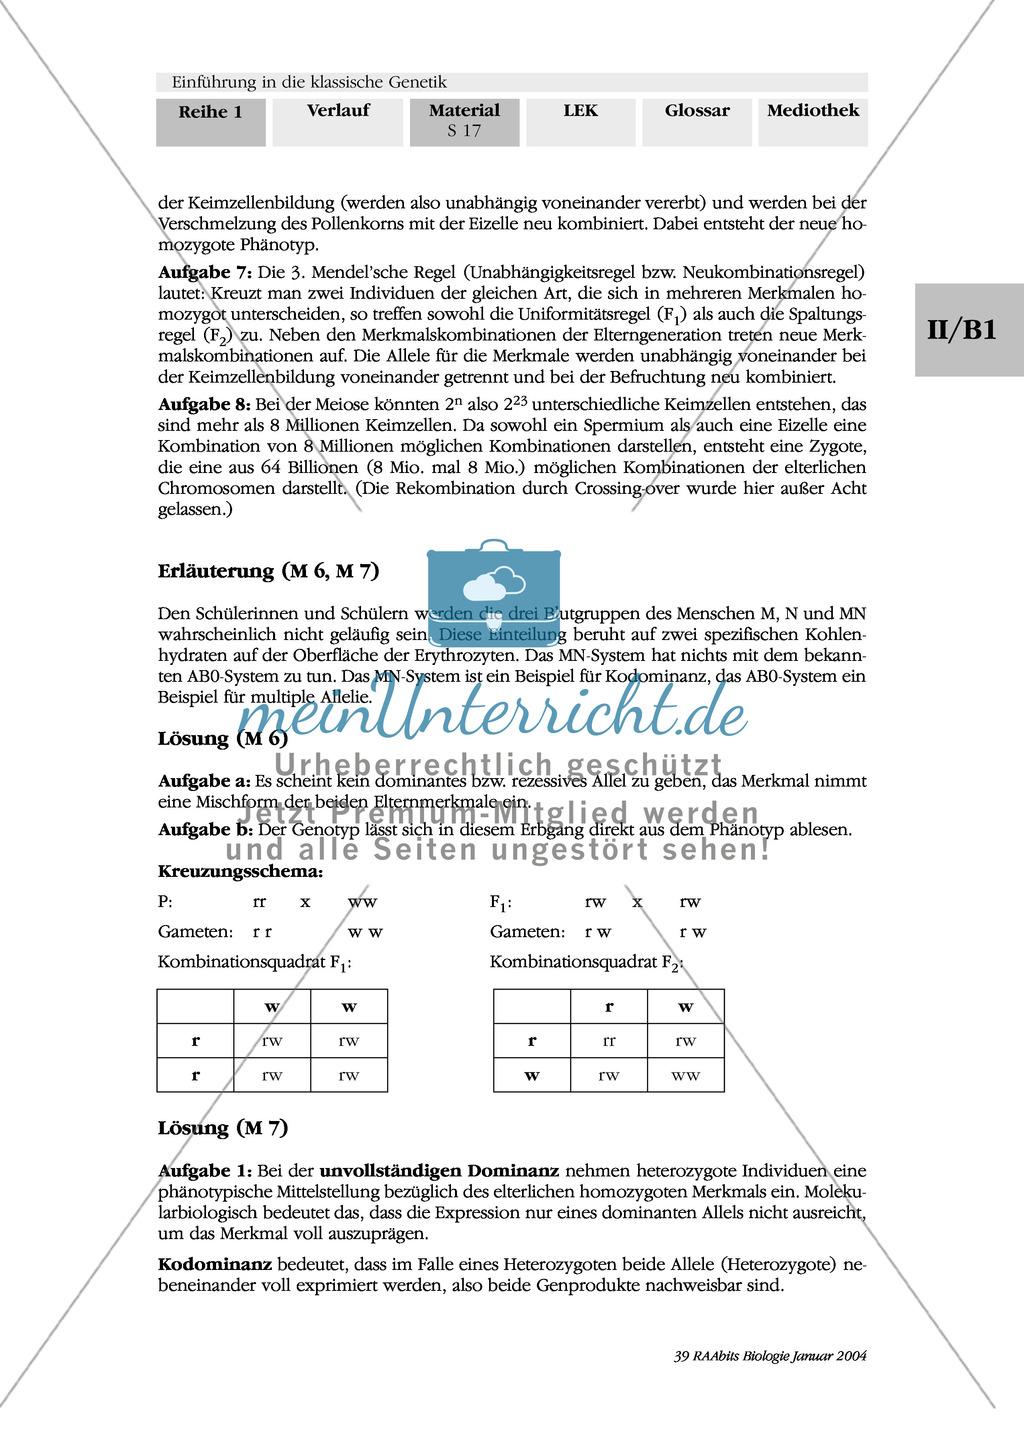 Klassische Genetik: Mendel`sche Regeln - Begriffe, Regeln, Kodominanz Preview 13